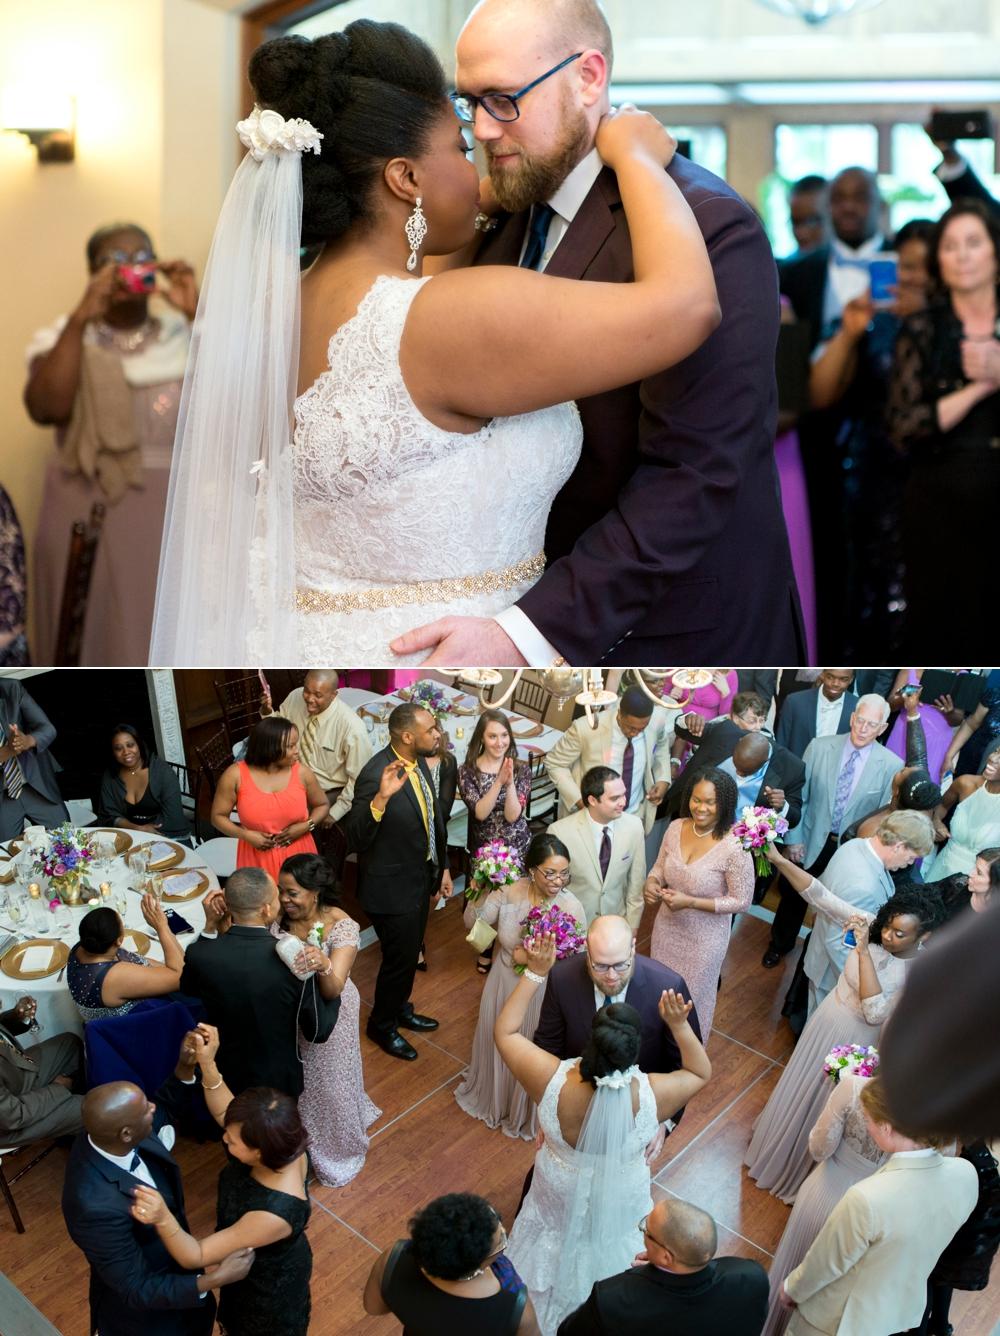 SomerbyJonesPhotography_WillowdaleWedding_Willowdale_Wedding_0048.jpg